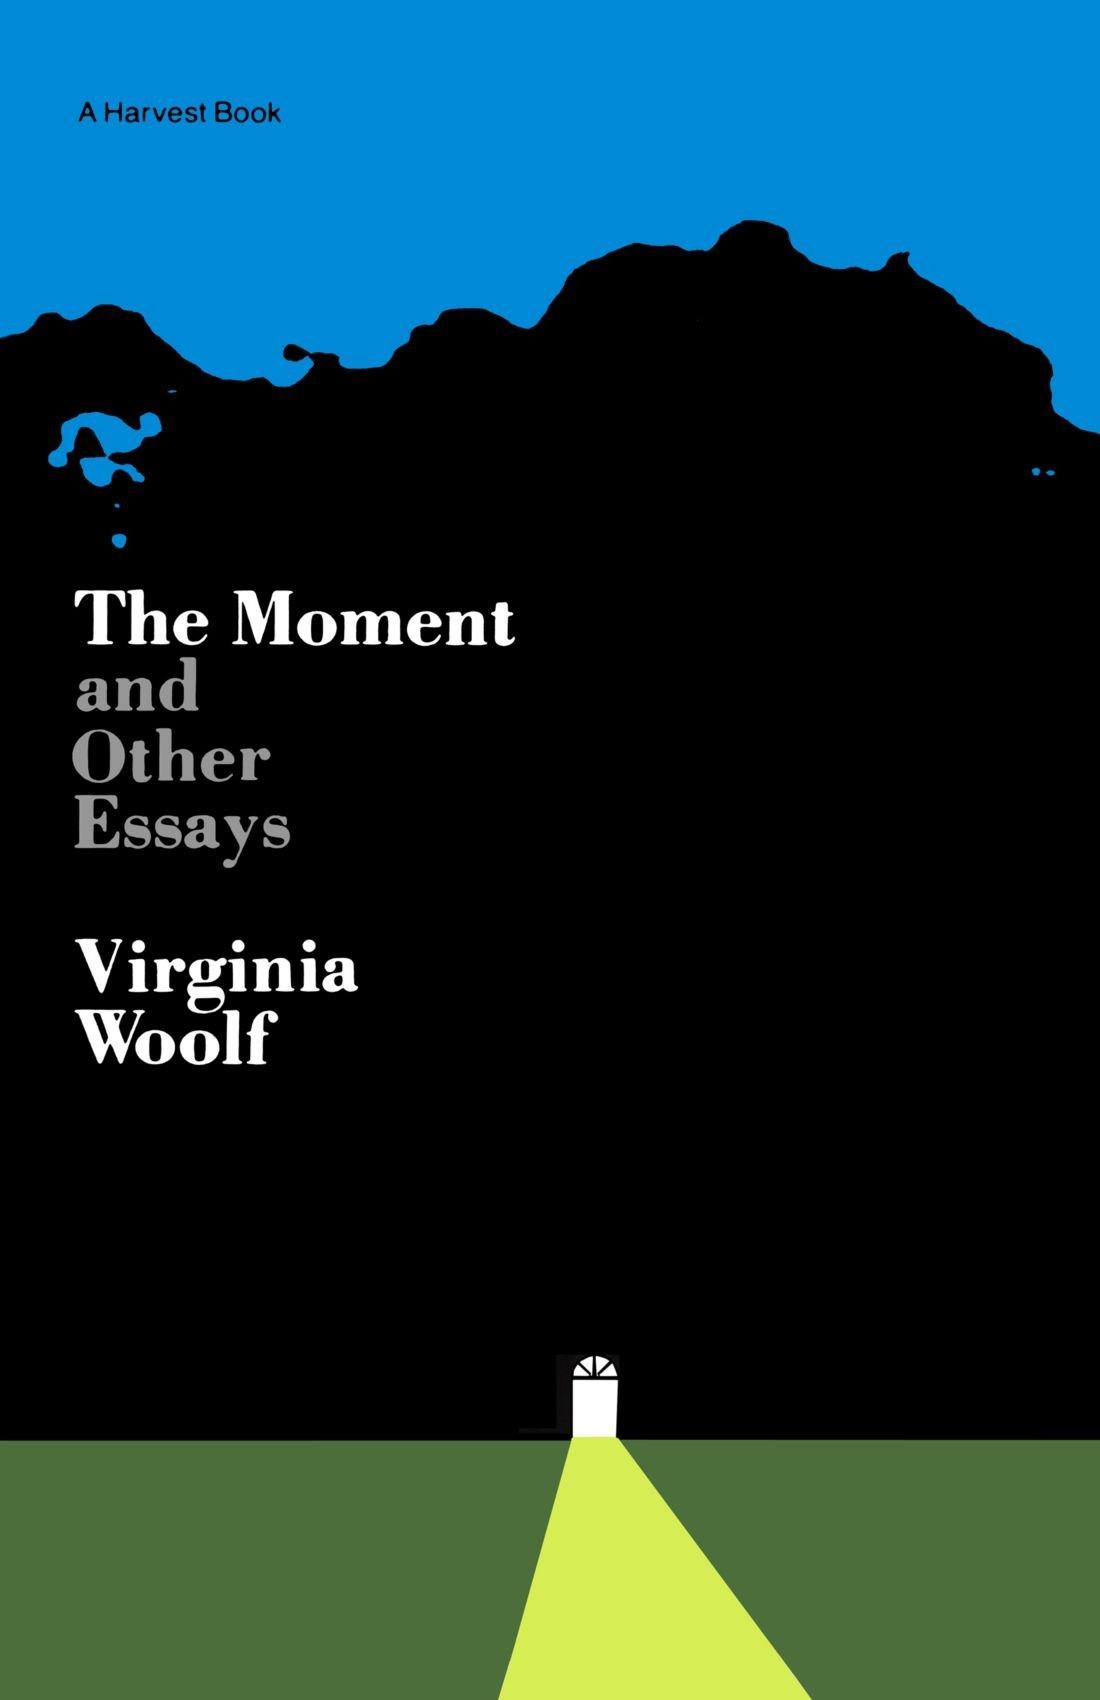 011 Virginia Woolf Essays Gs8rmzl Essay Unusual Online The Modern Analysis On Self Full